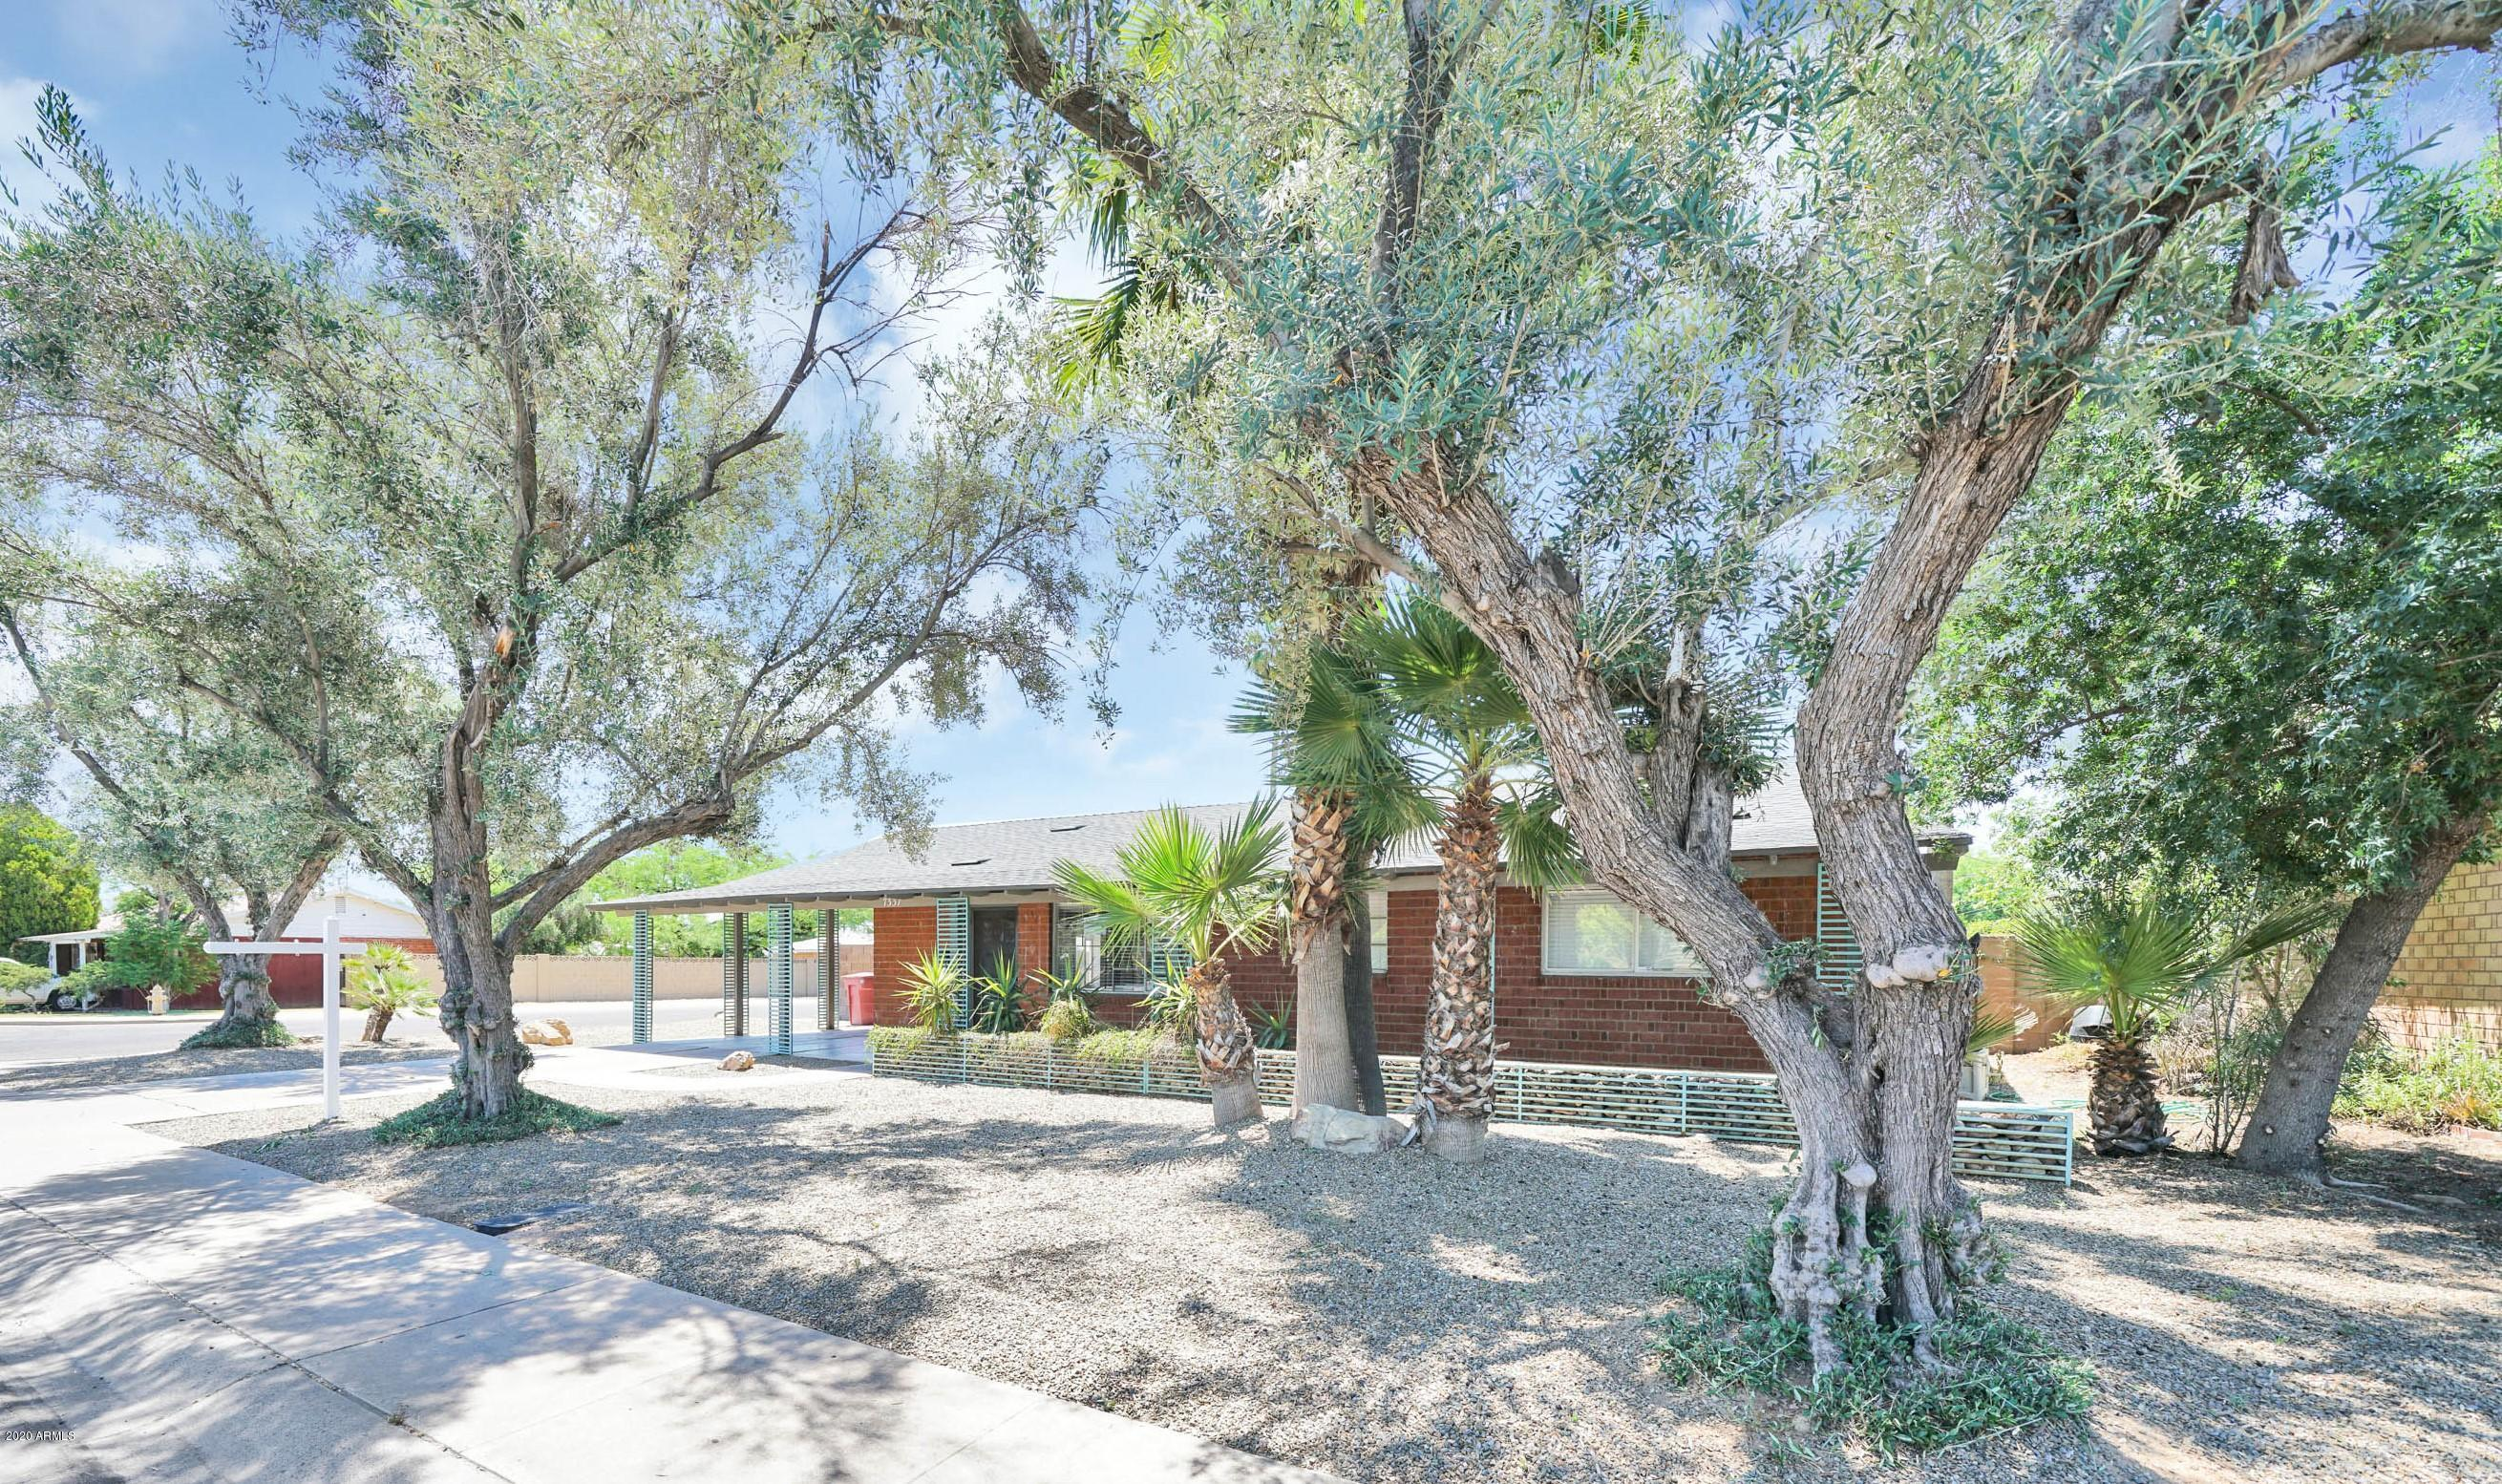 MLS 6084811 7337 E PALM Lane, Scottsdale, AZ 85257 Scottsdale AZ Scottsdale Estates